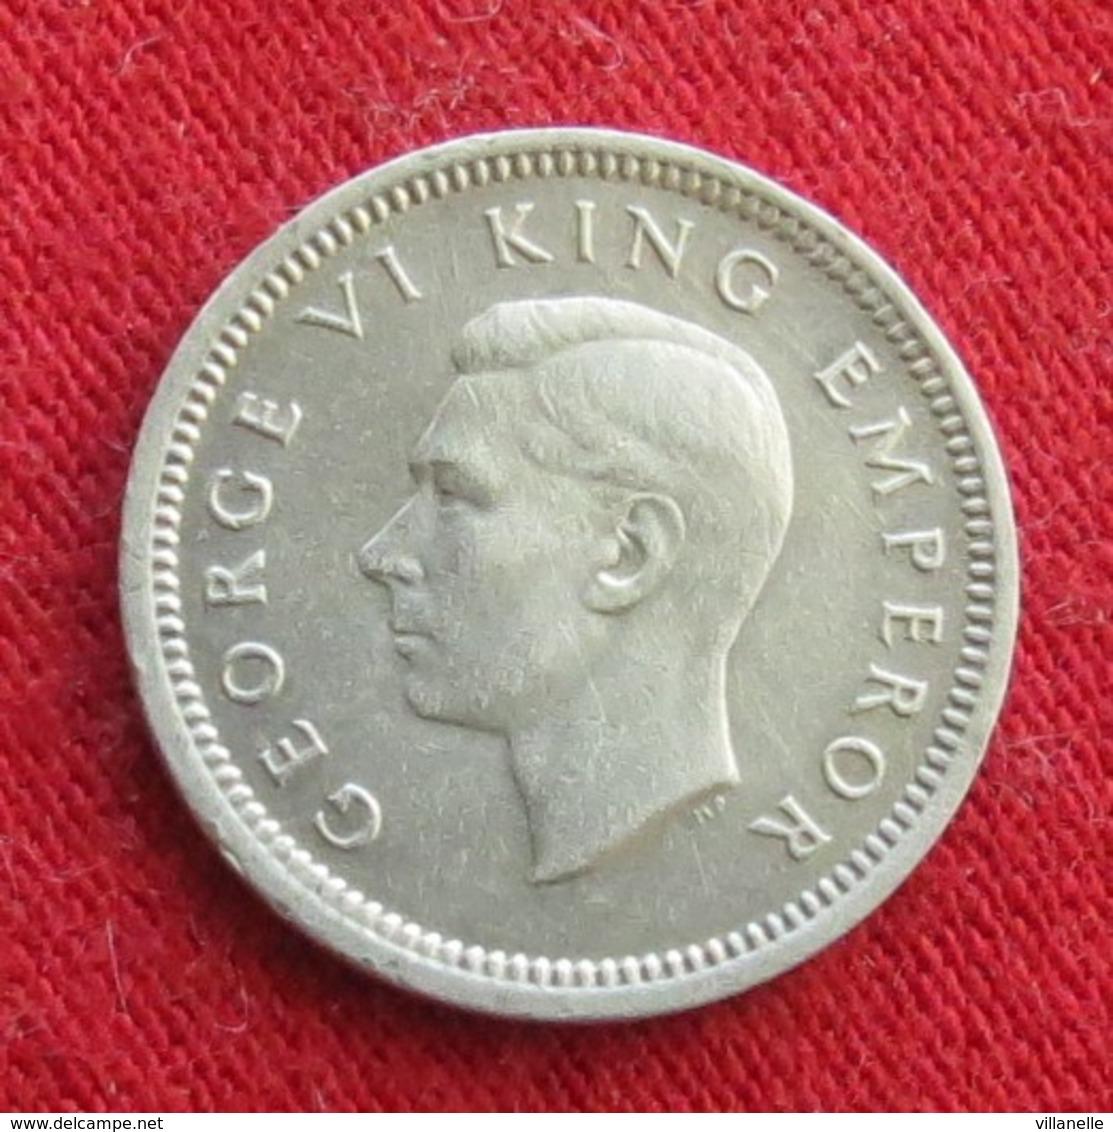 New Zealand 3 Pence 1942 KM# 7 Silver  Nova Zelandia Nuova Zelanda Nouvelle Zelande Neu Seeland - Nouvelle-Zélande